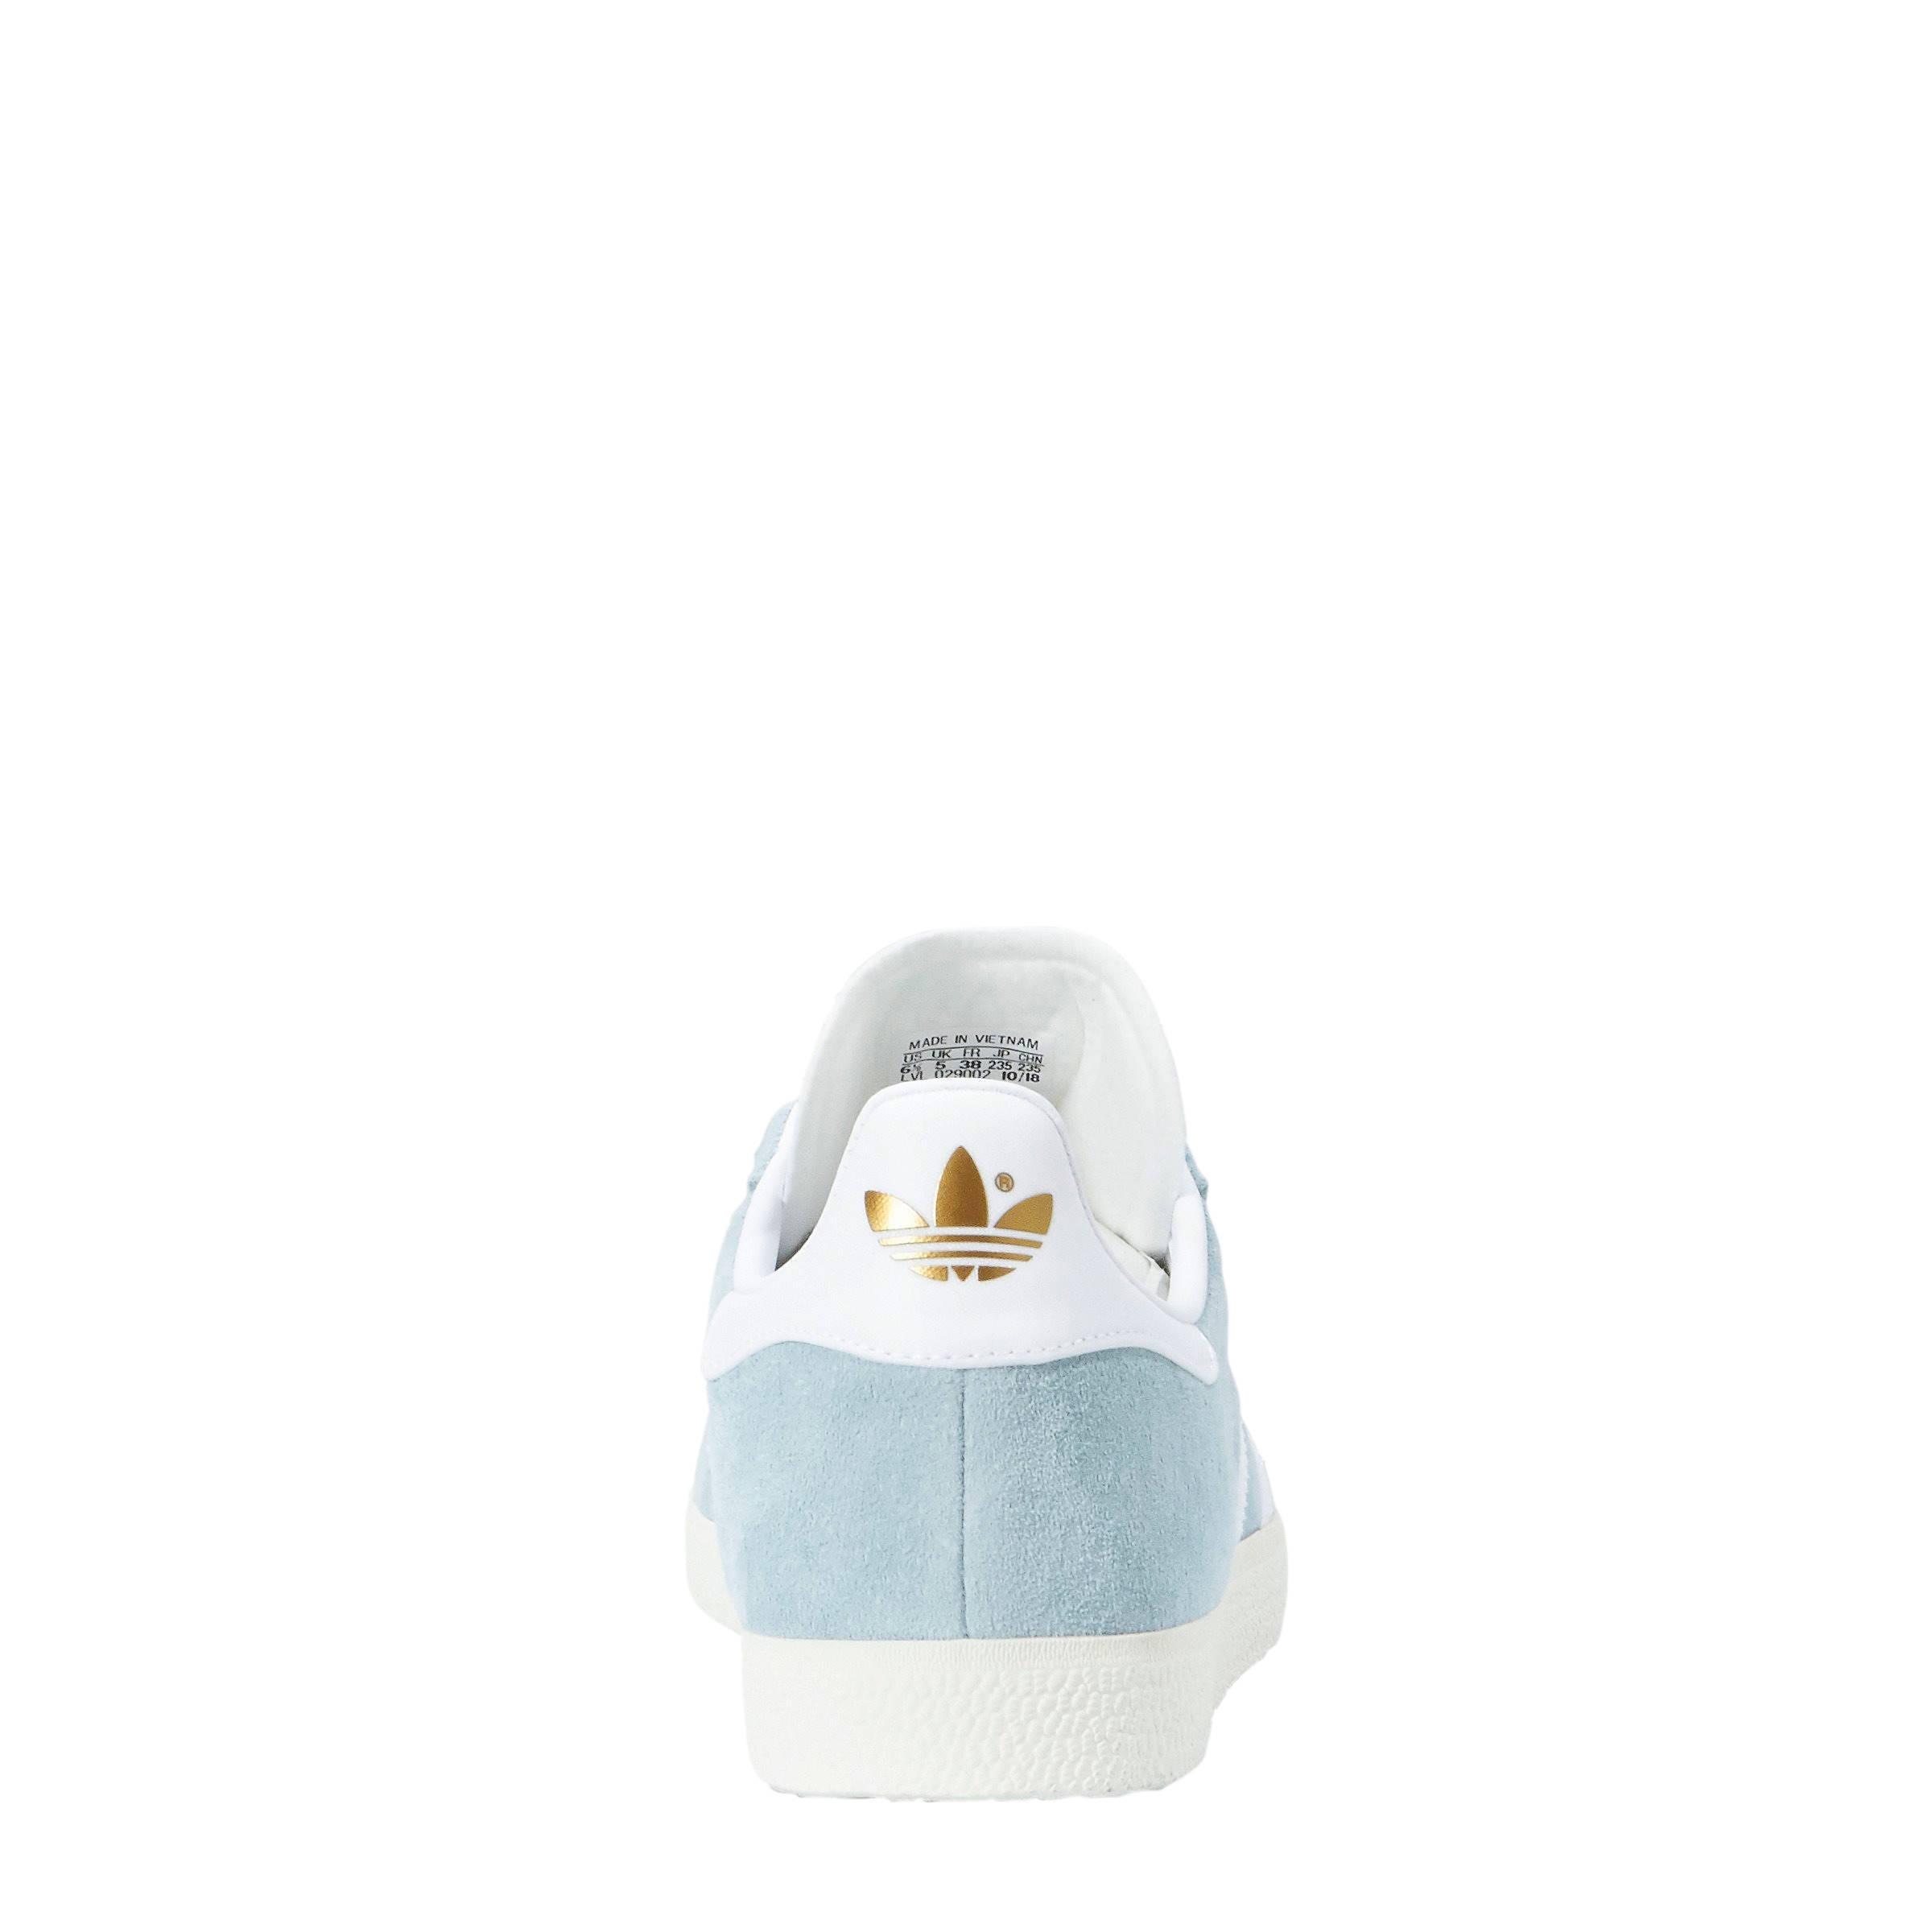 6c4b56e1a20 adidas originals Gazelle sneakers lichtblauw/wit | wehkamp